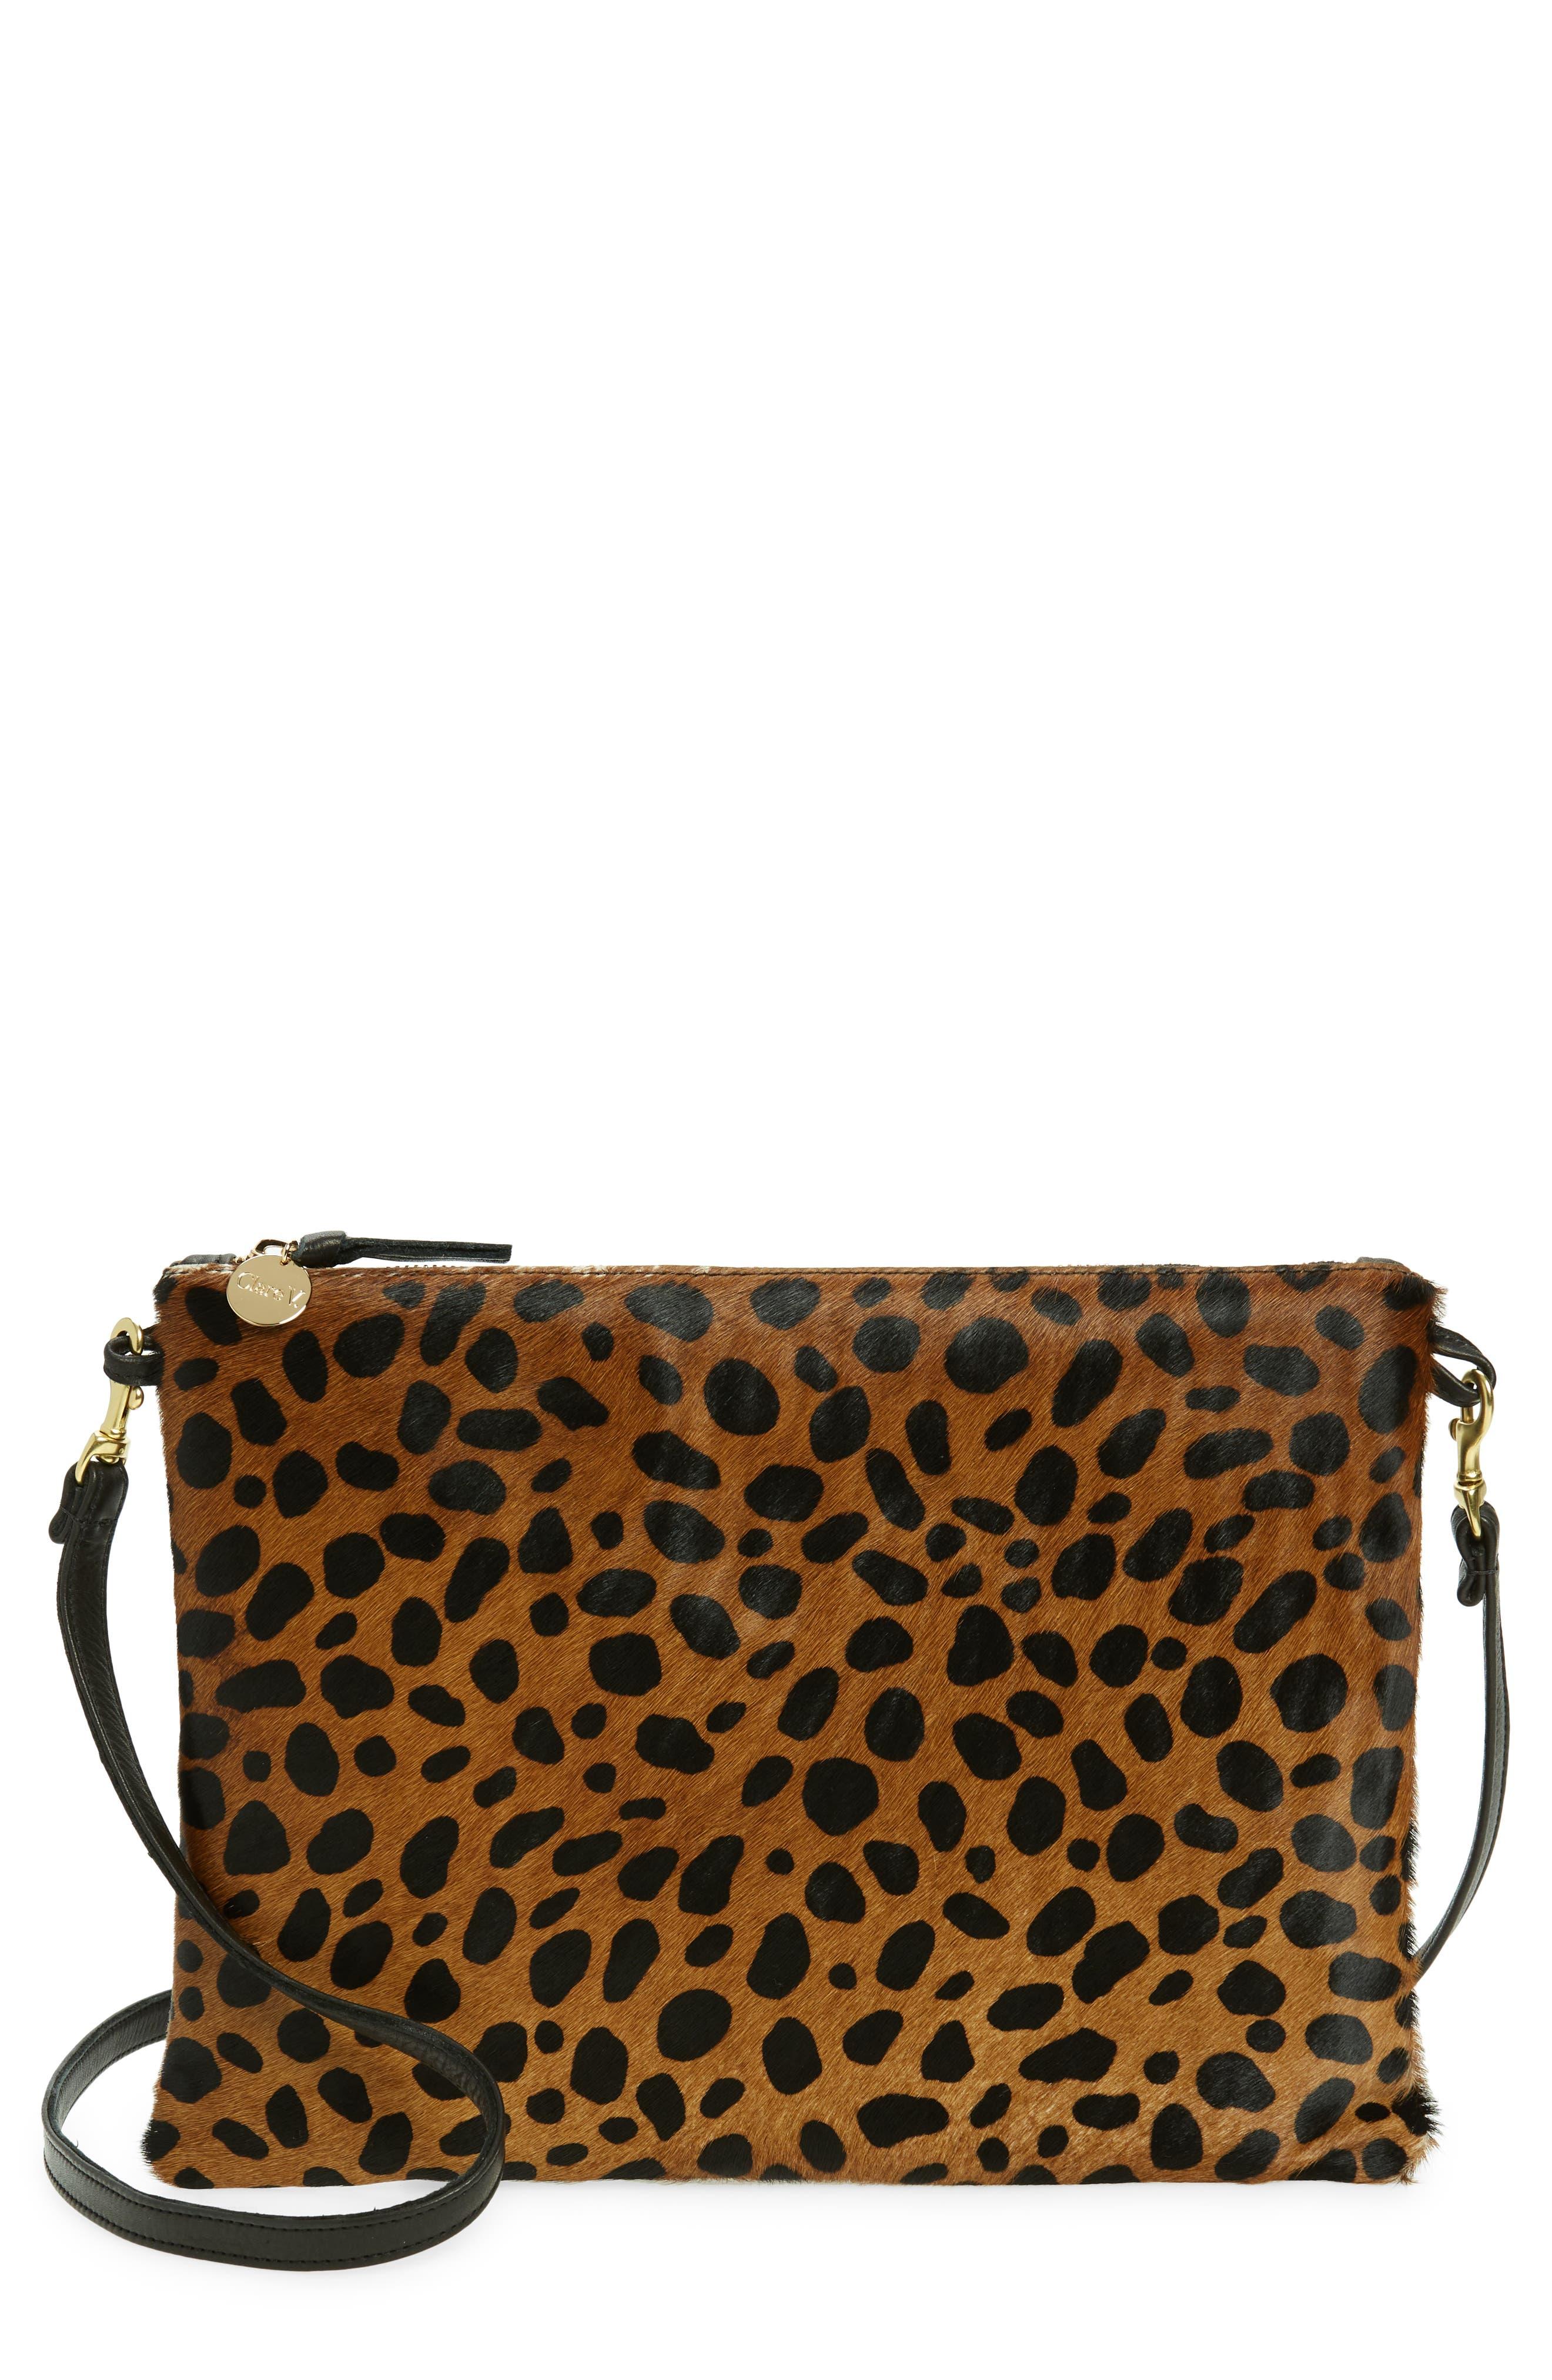 Sac Bretelle Leather & Genuine Calf Hair Crossbody Bag